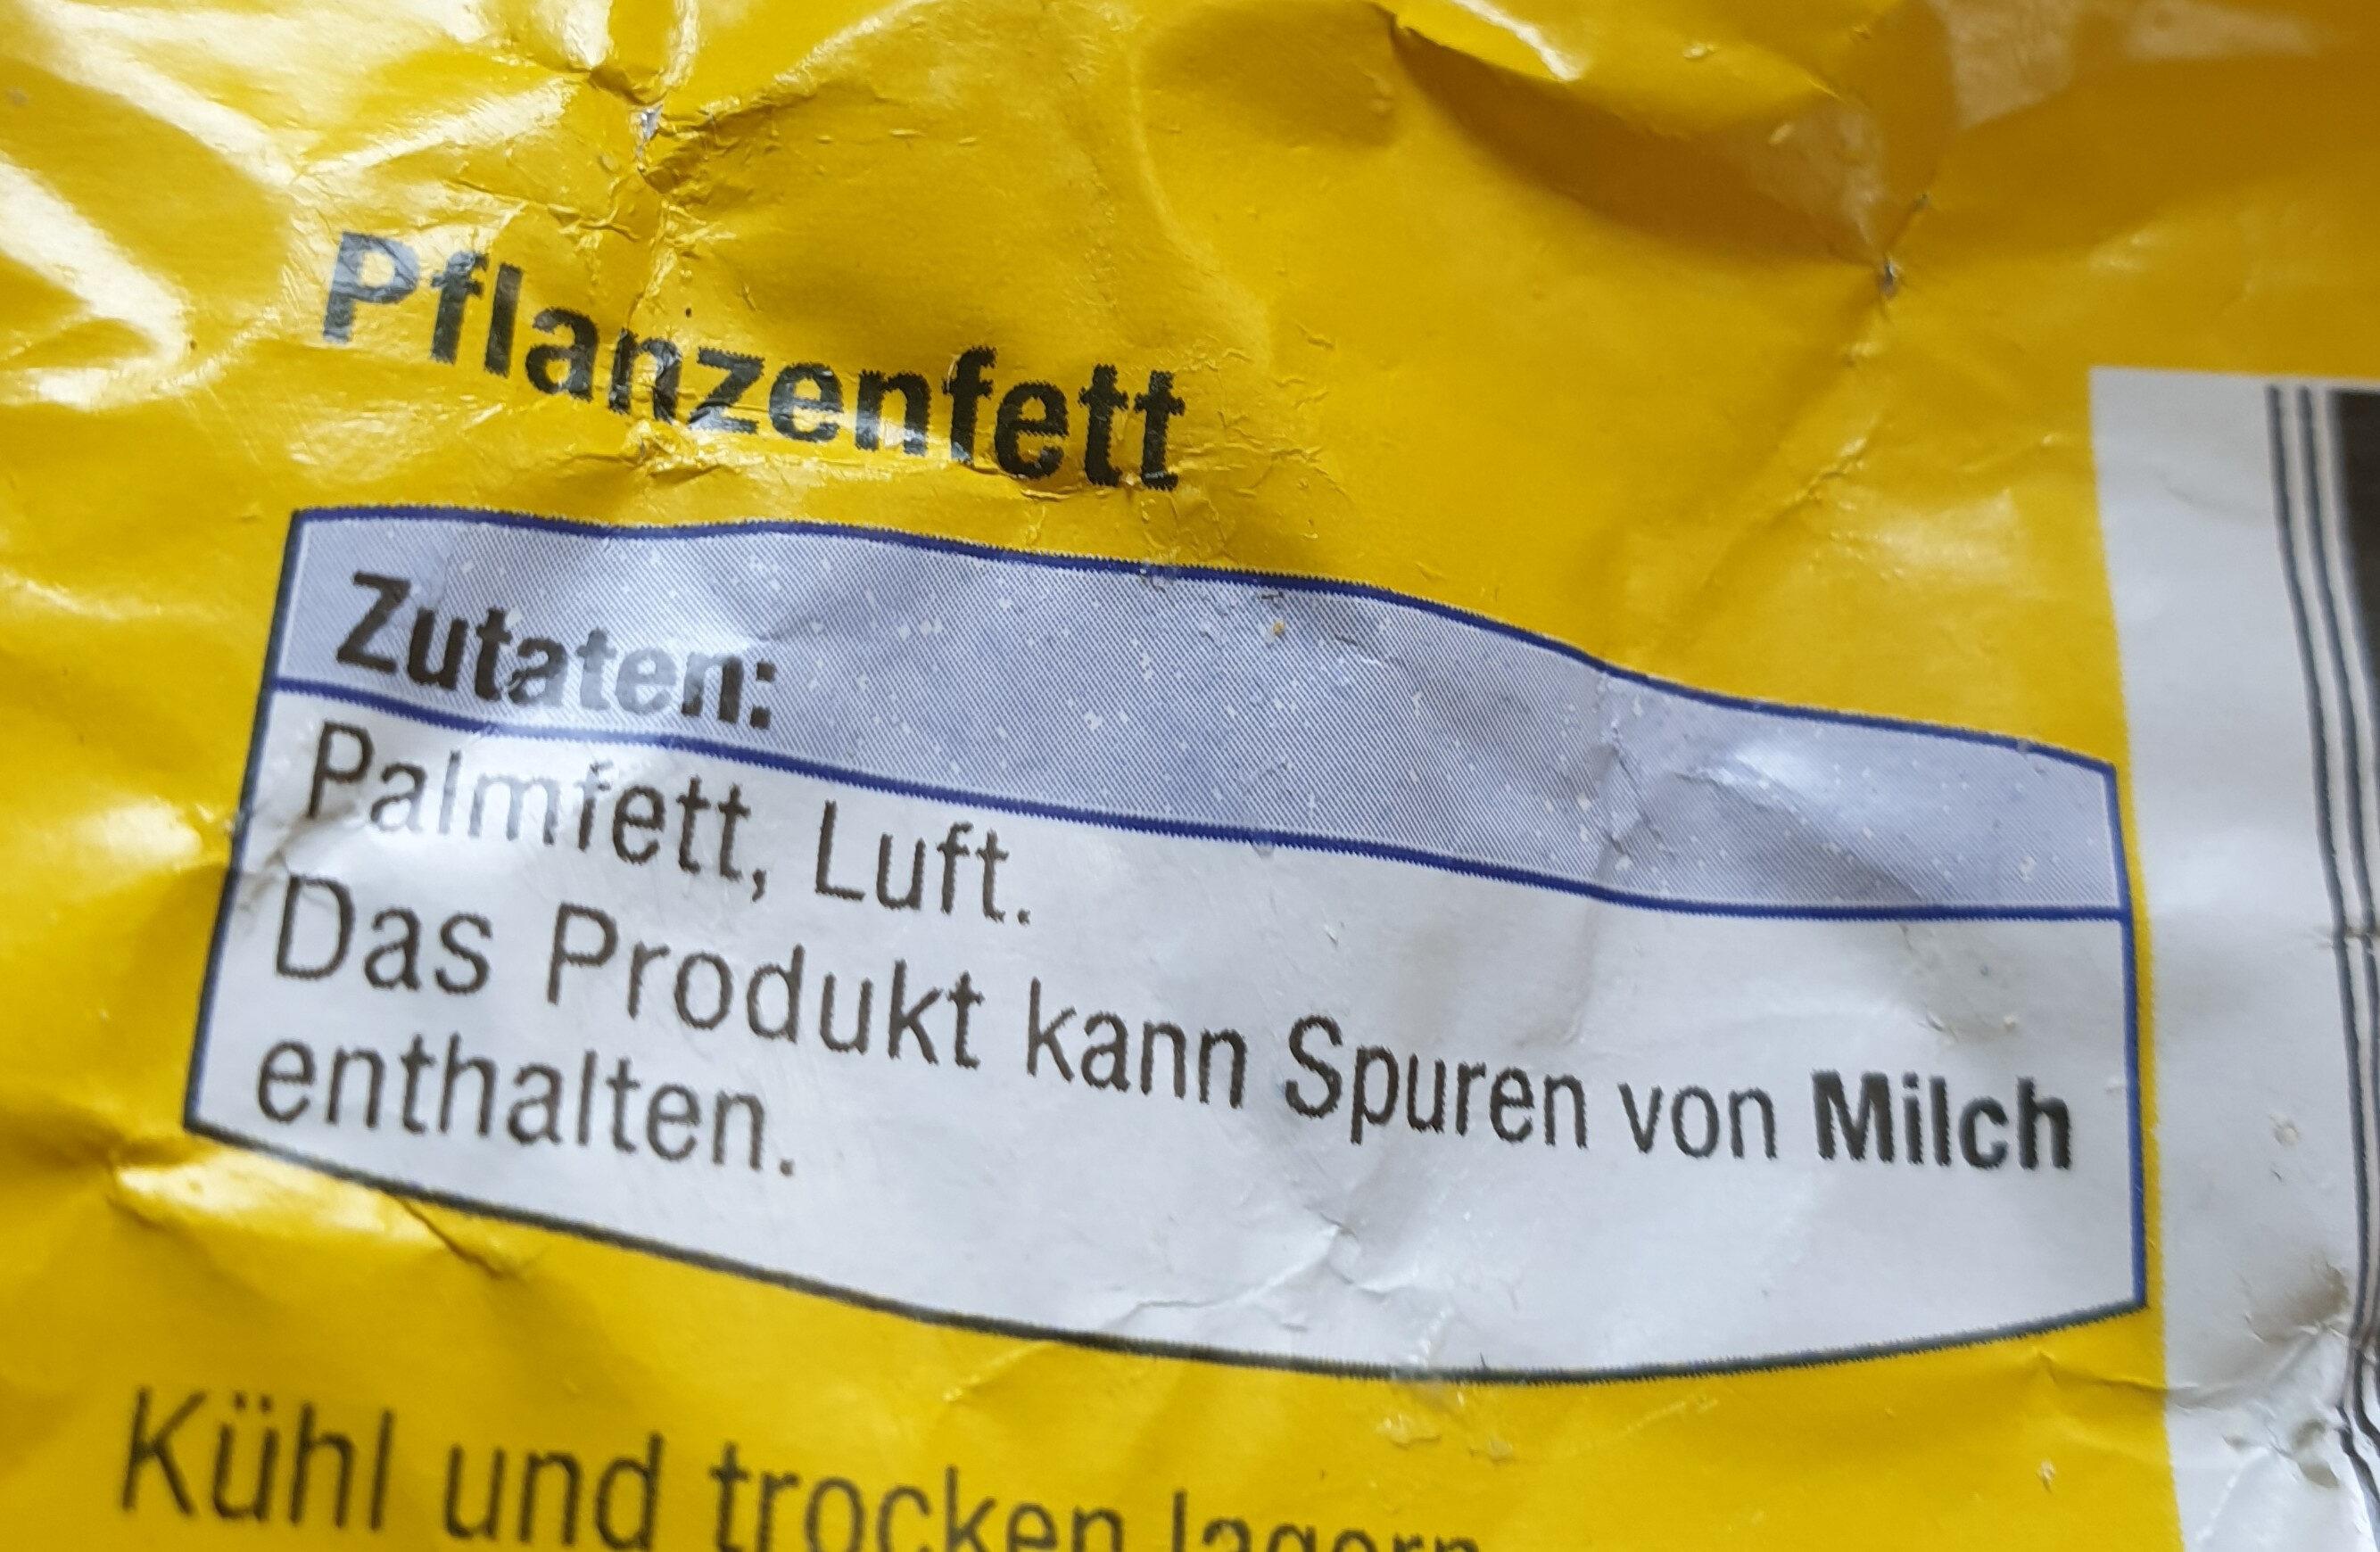 pflanzenfett - Ingrediënten